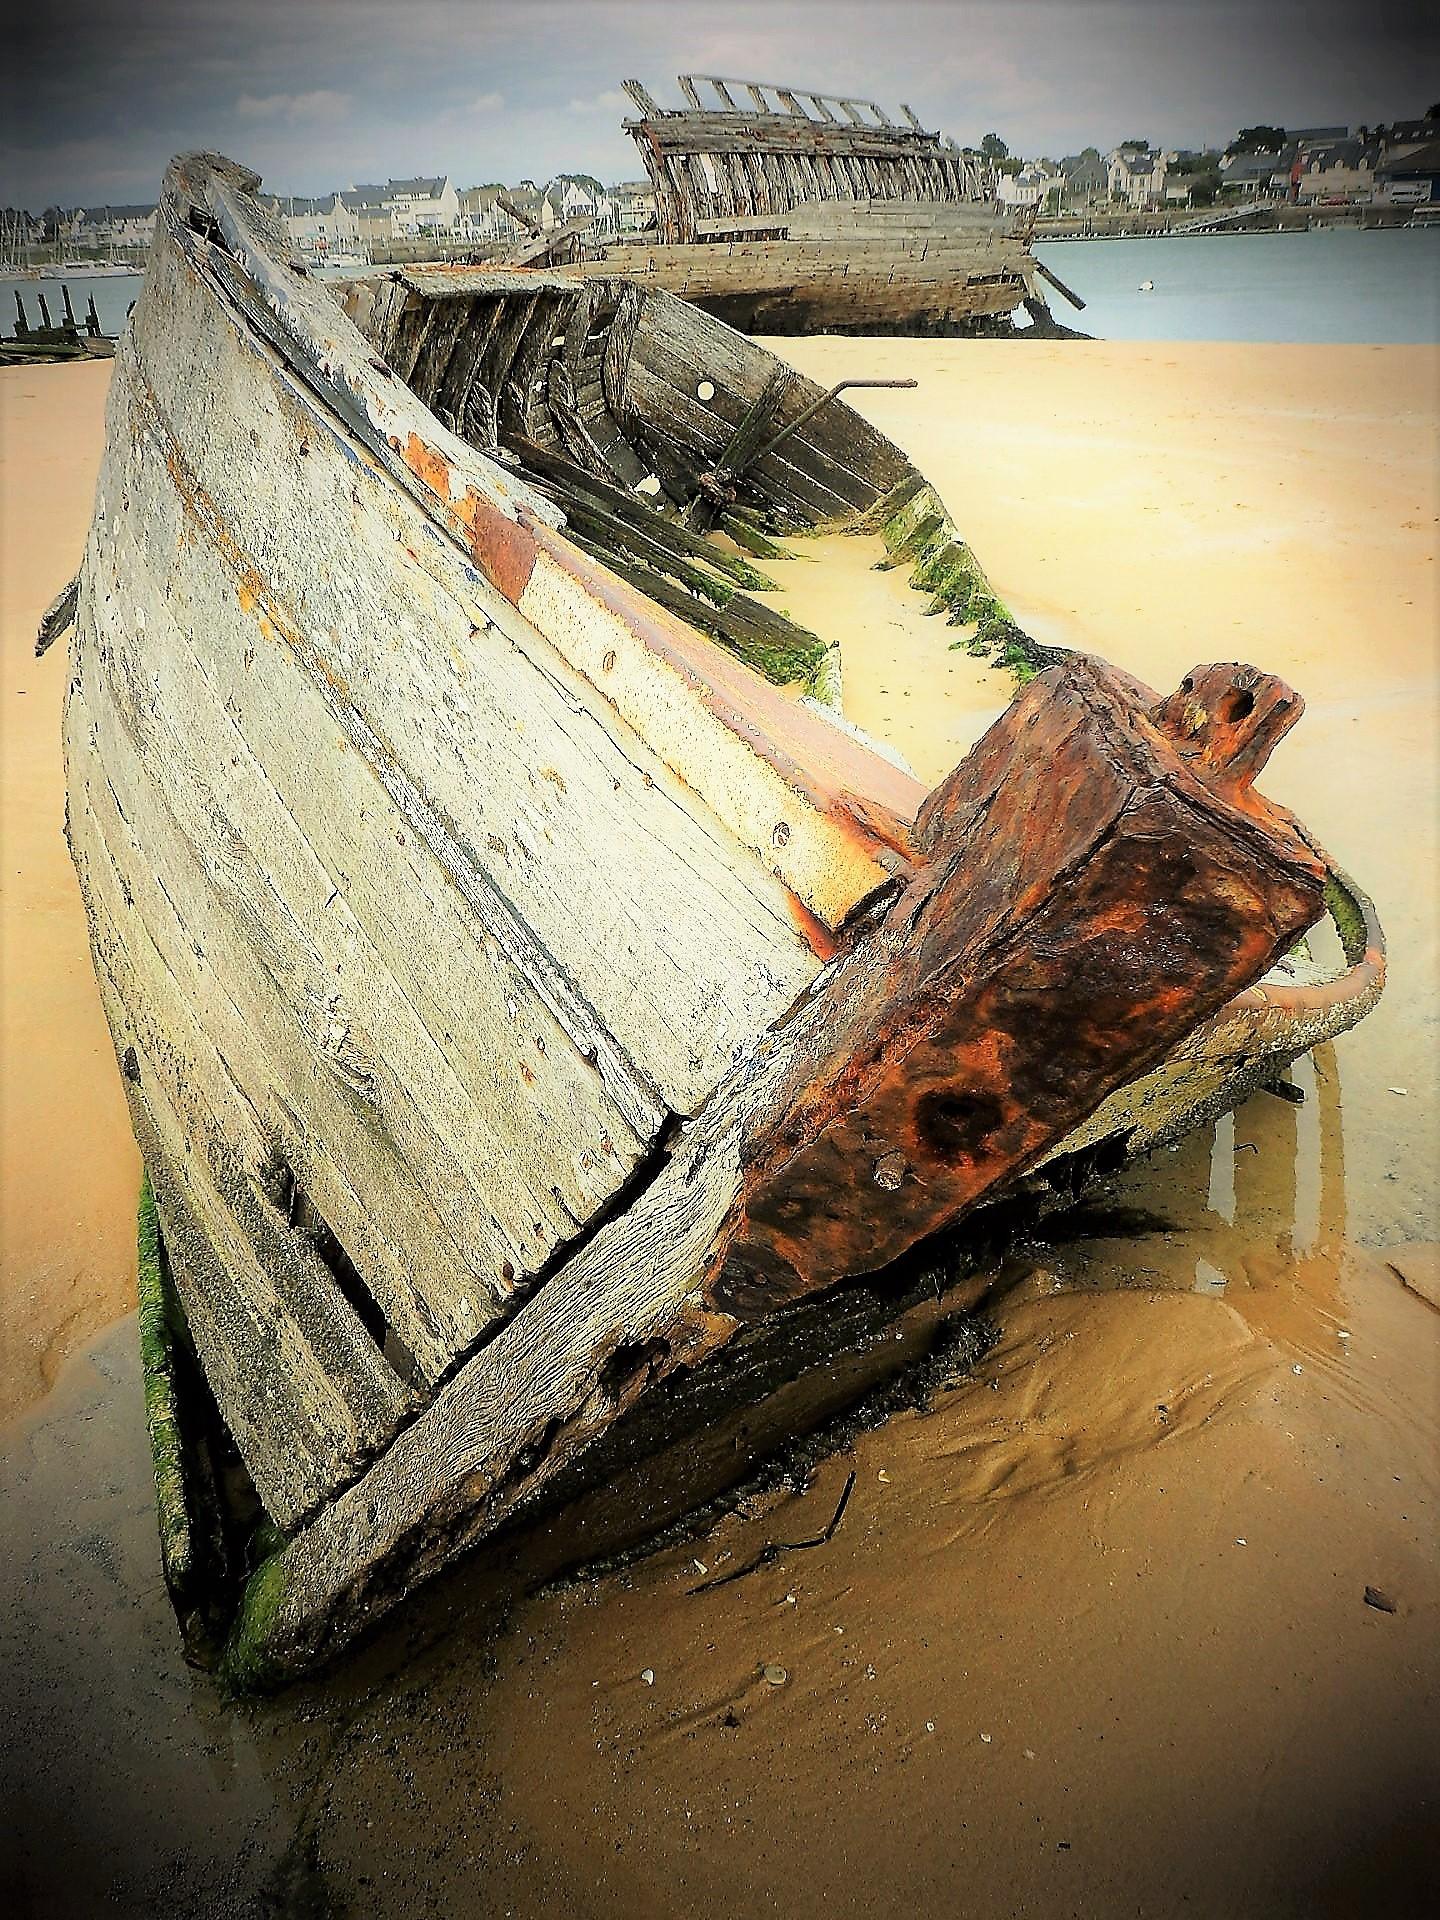 L'ankou marin, bateaux en perdition |